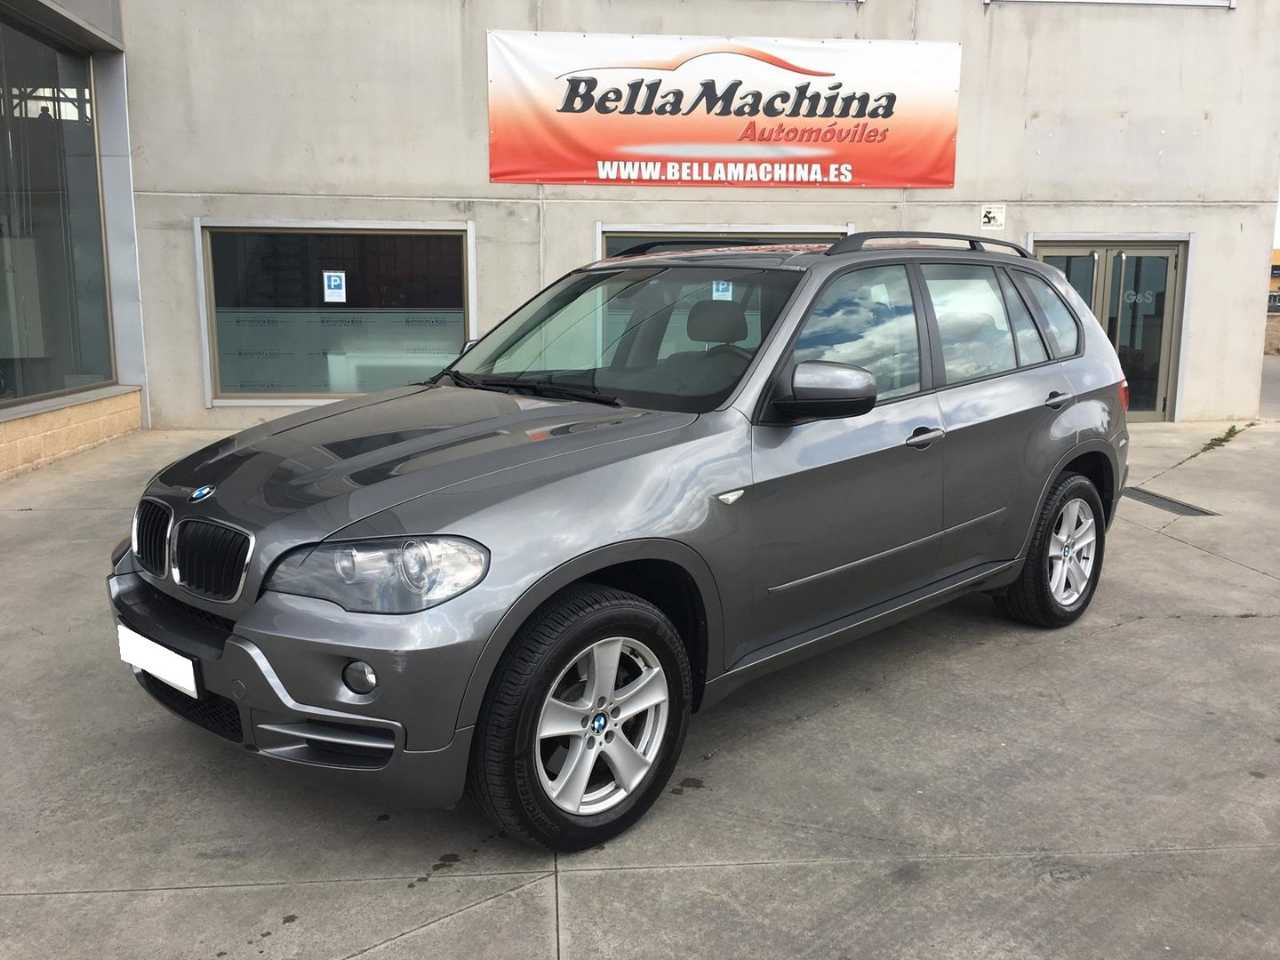 BMW X5 3.0 DIESEL * CUERO BEIGE * TECHO *  - Foto 1